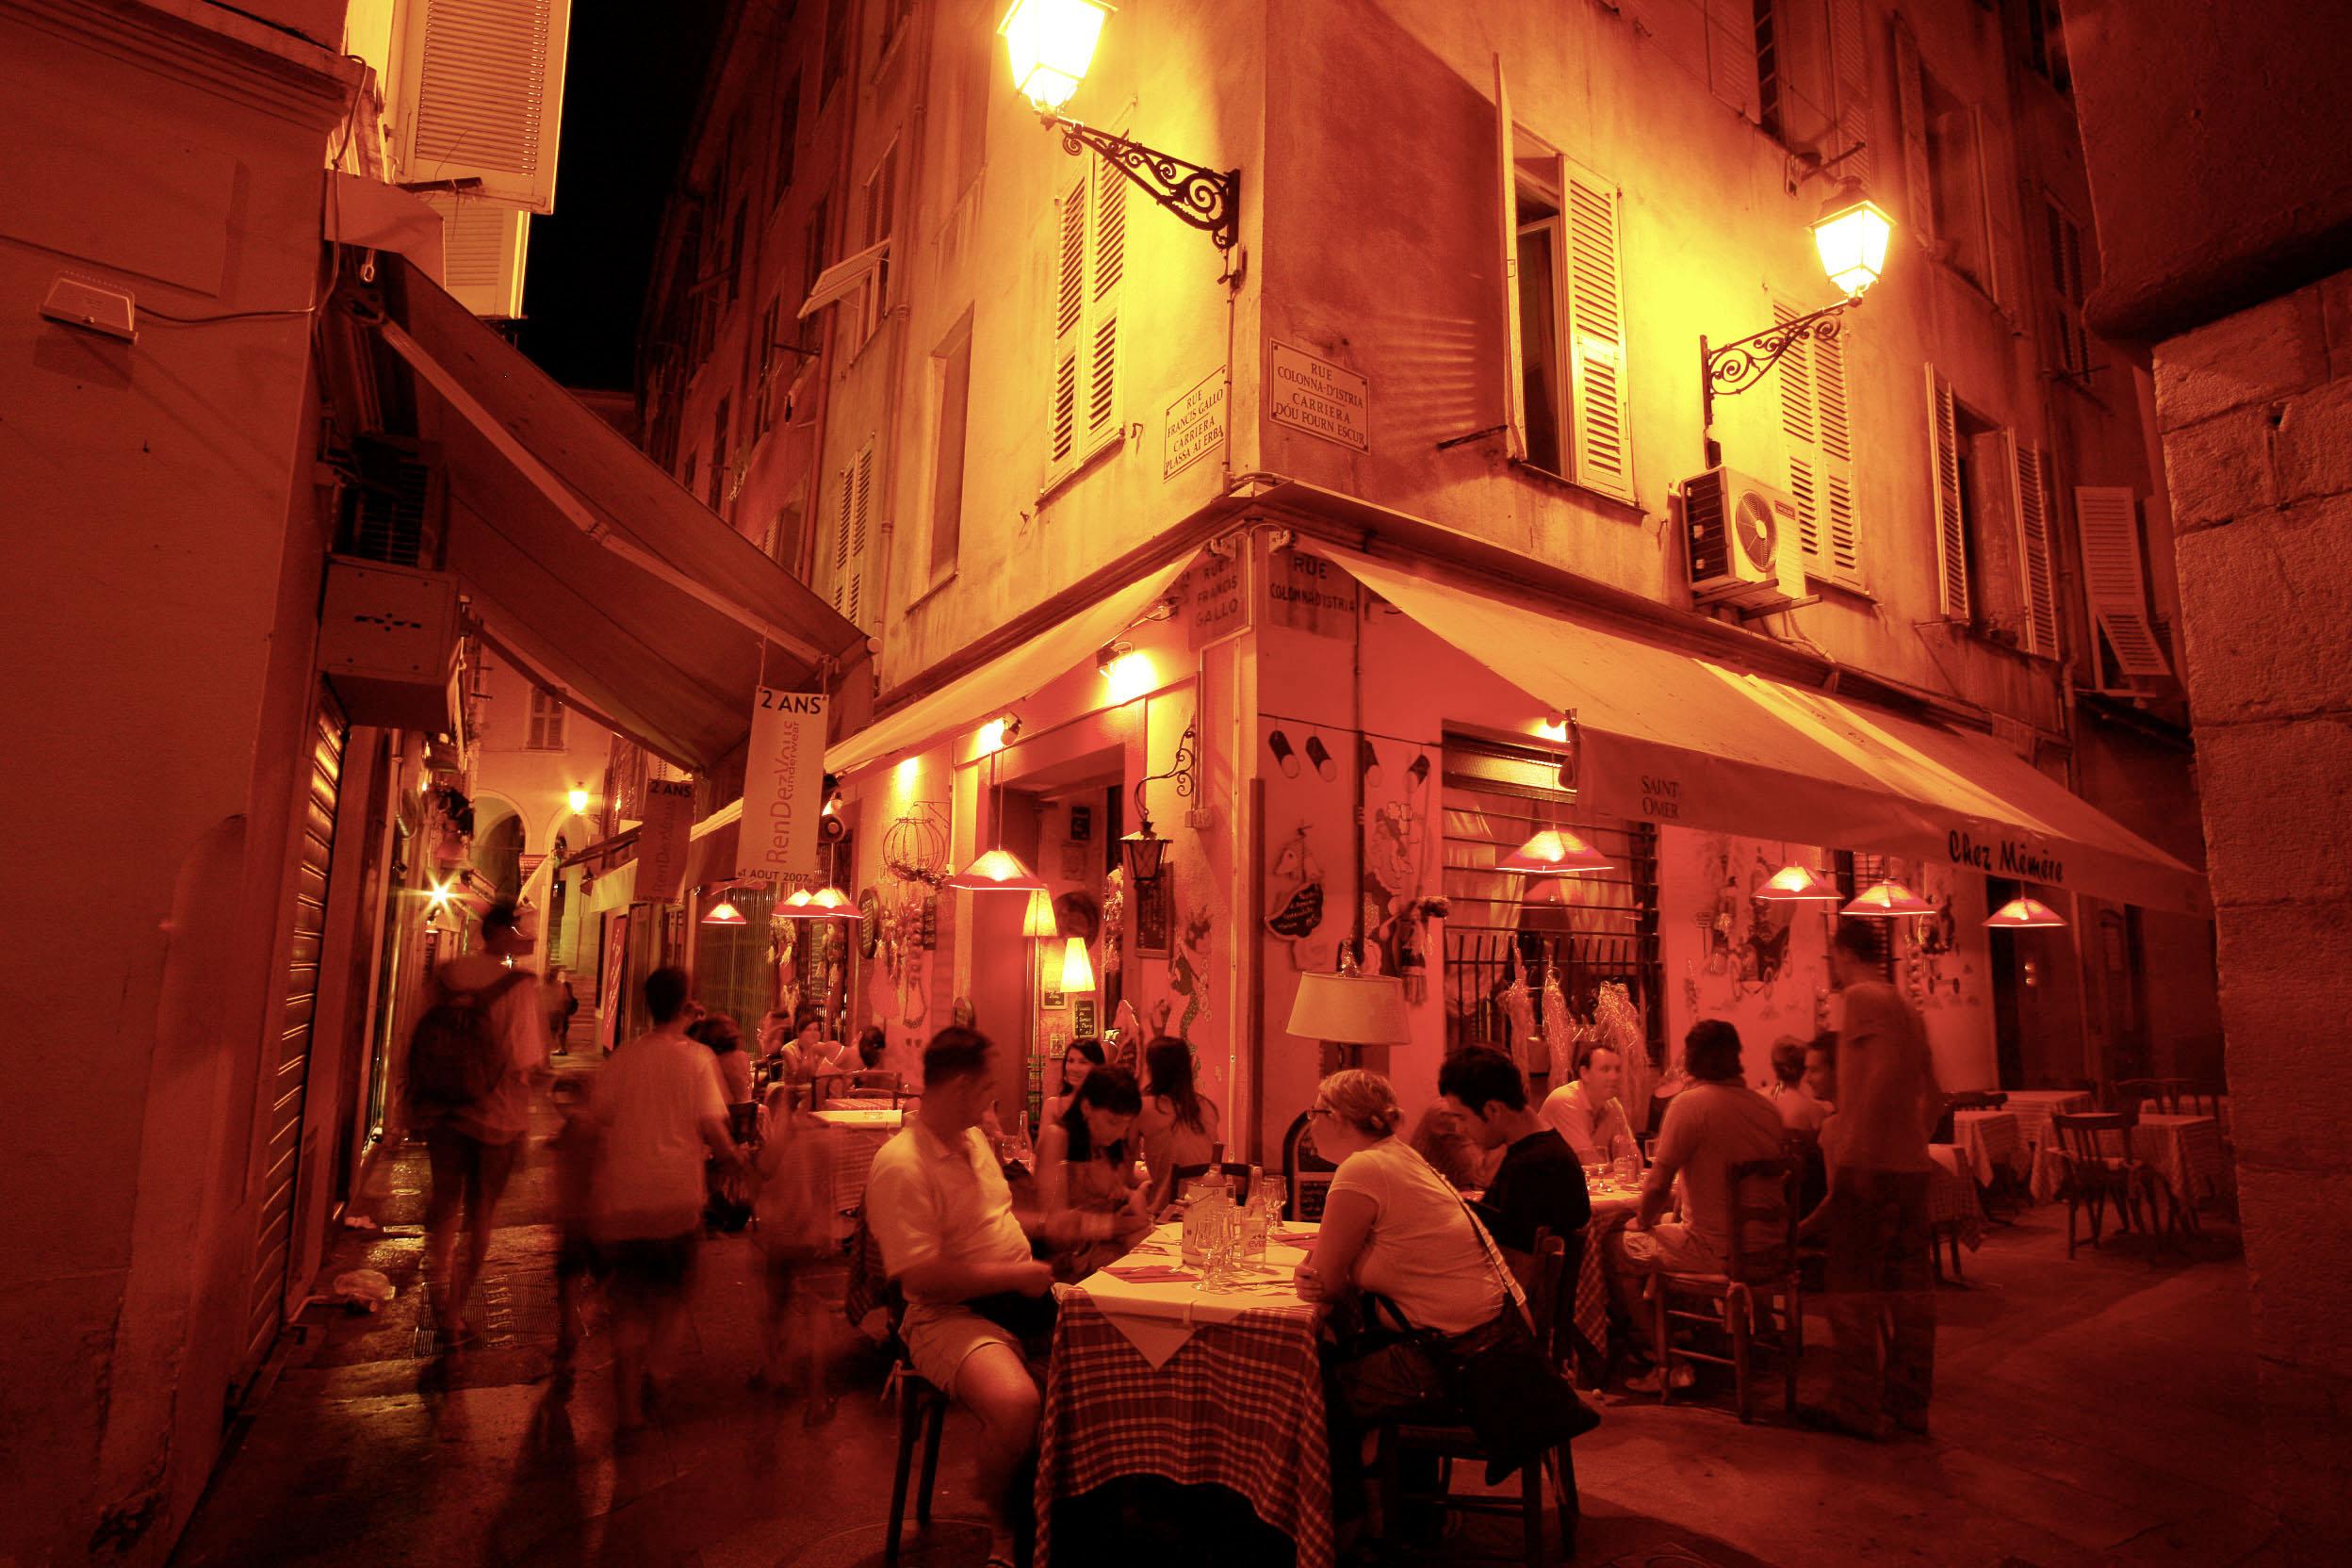 France, Cote d´Azur, Nice, Restaurant Scene in Old Town  ©  Reiner Riedler